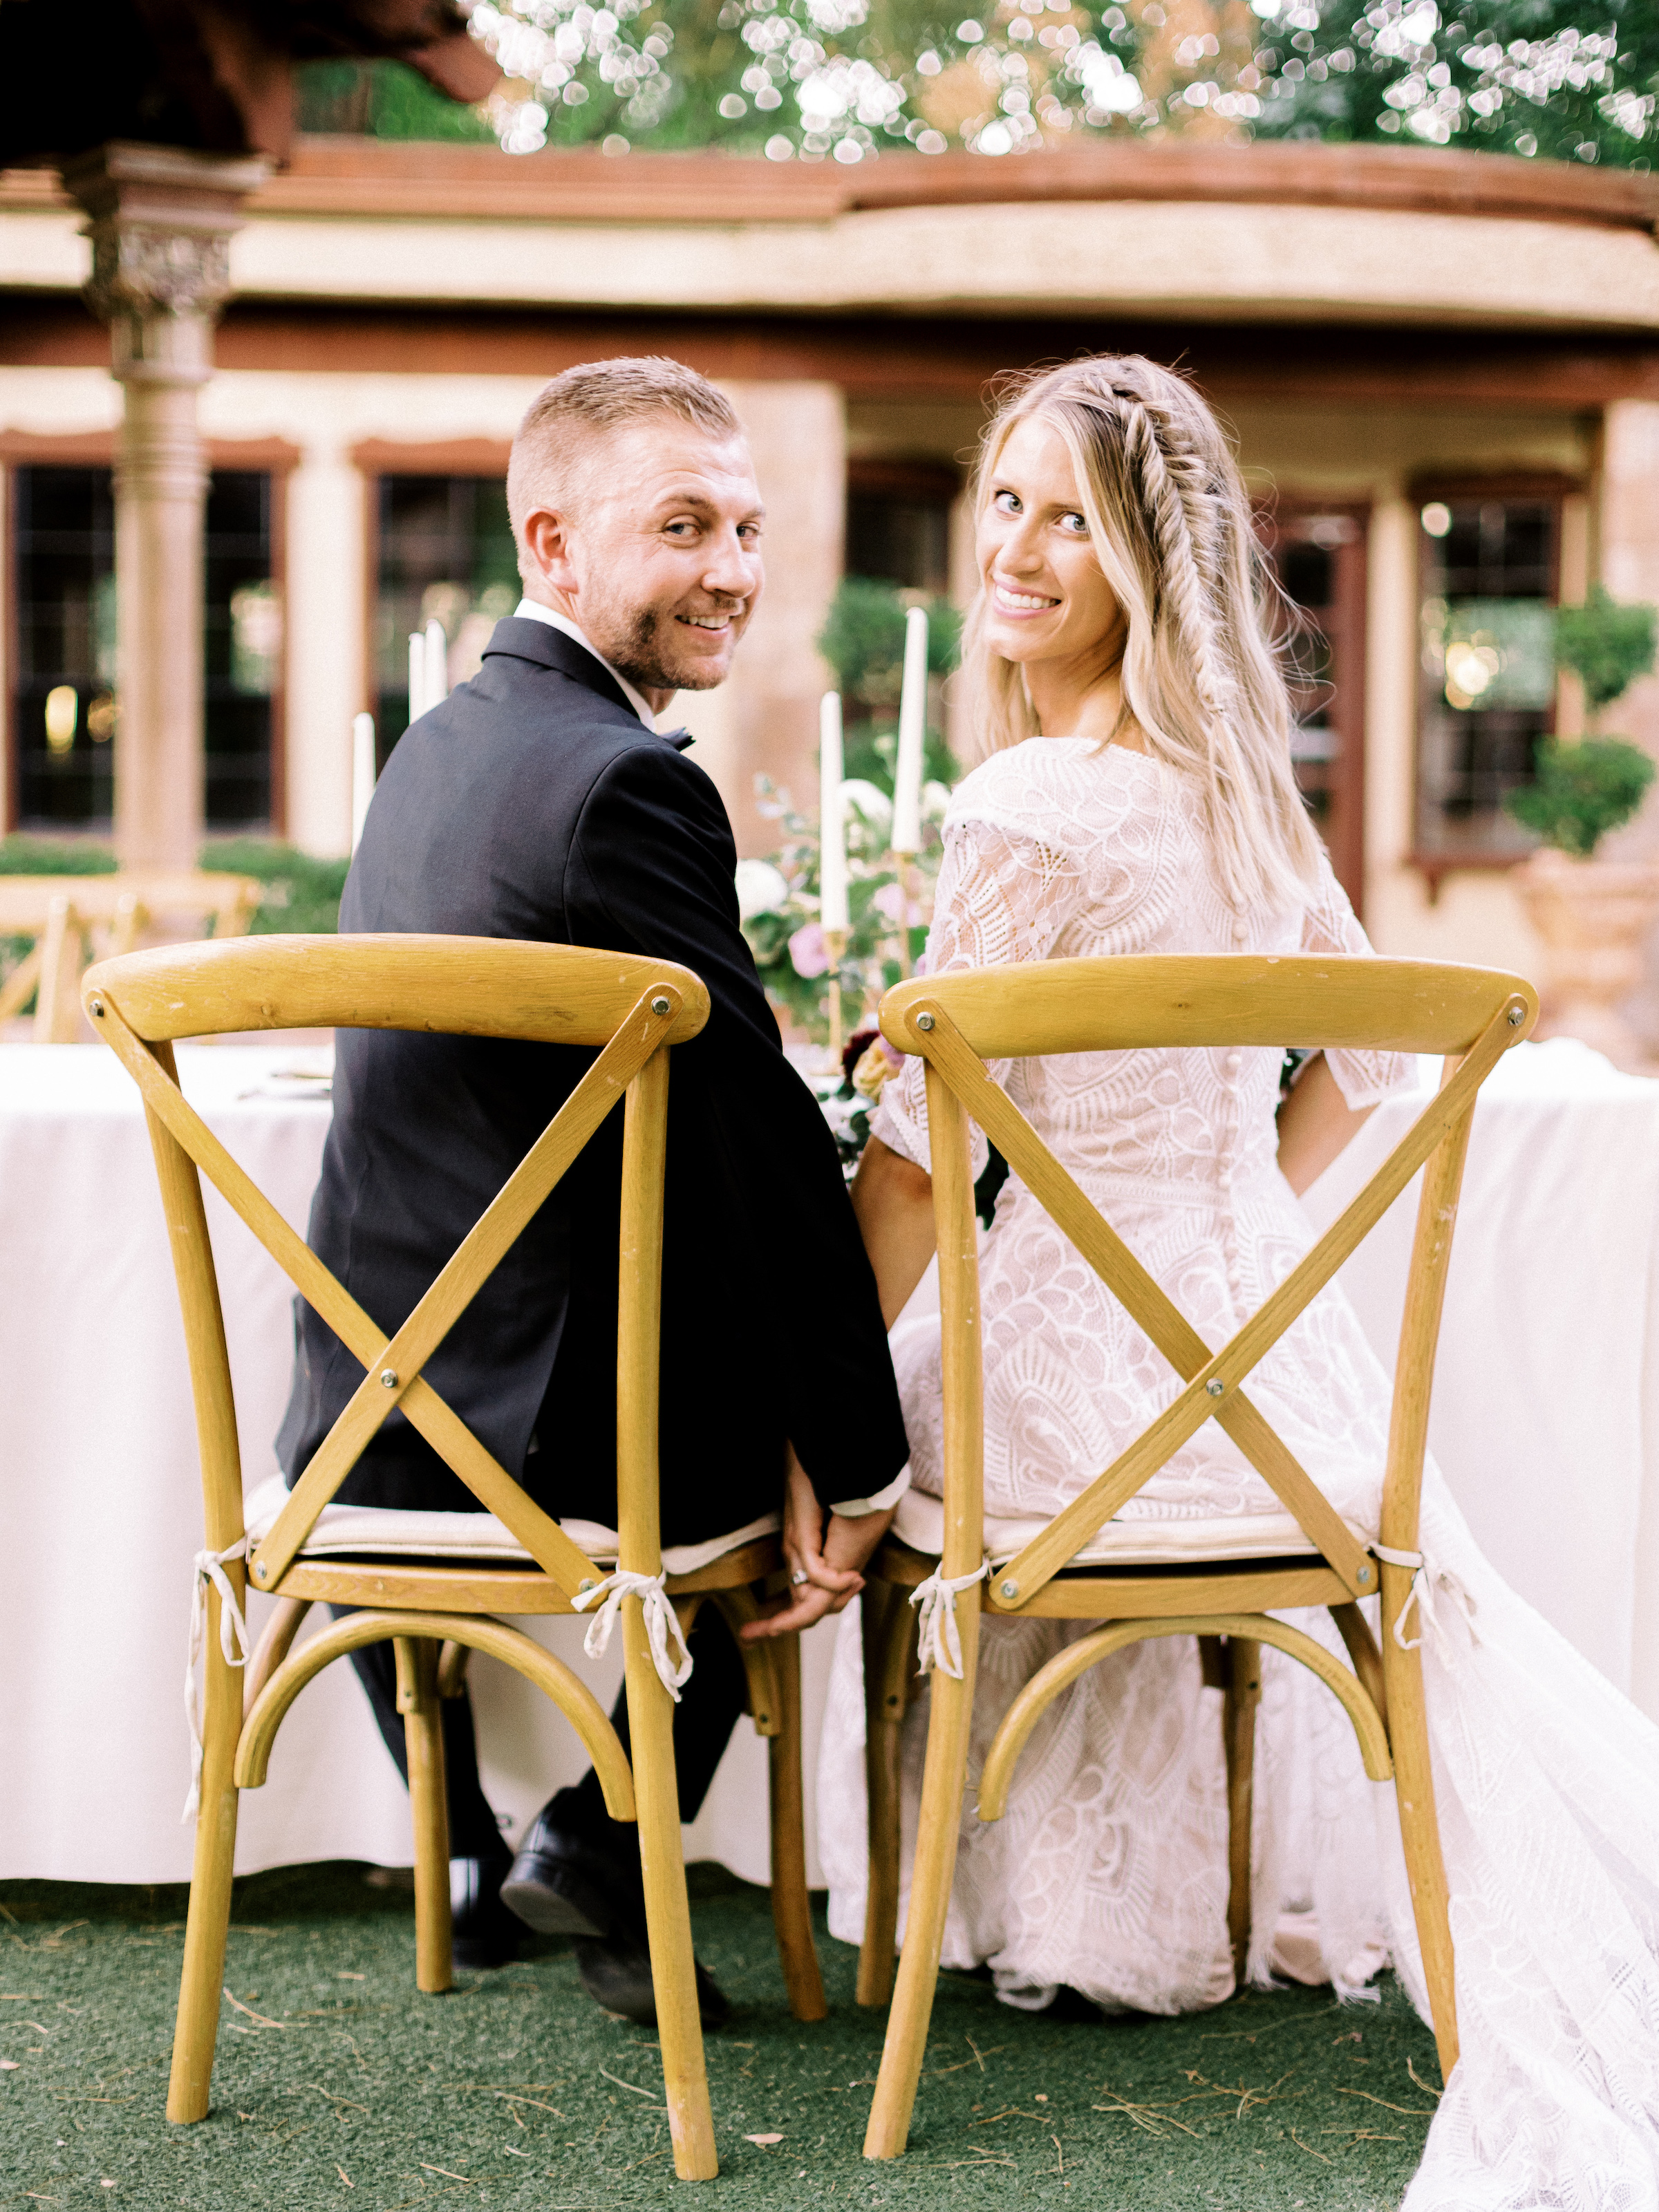 Boho Chic Long Sleeve Wedding Dress Fishtail Braid Wright House Truth And Beauty Photography 5